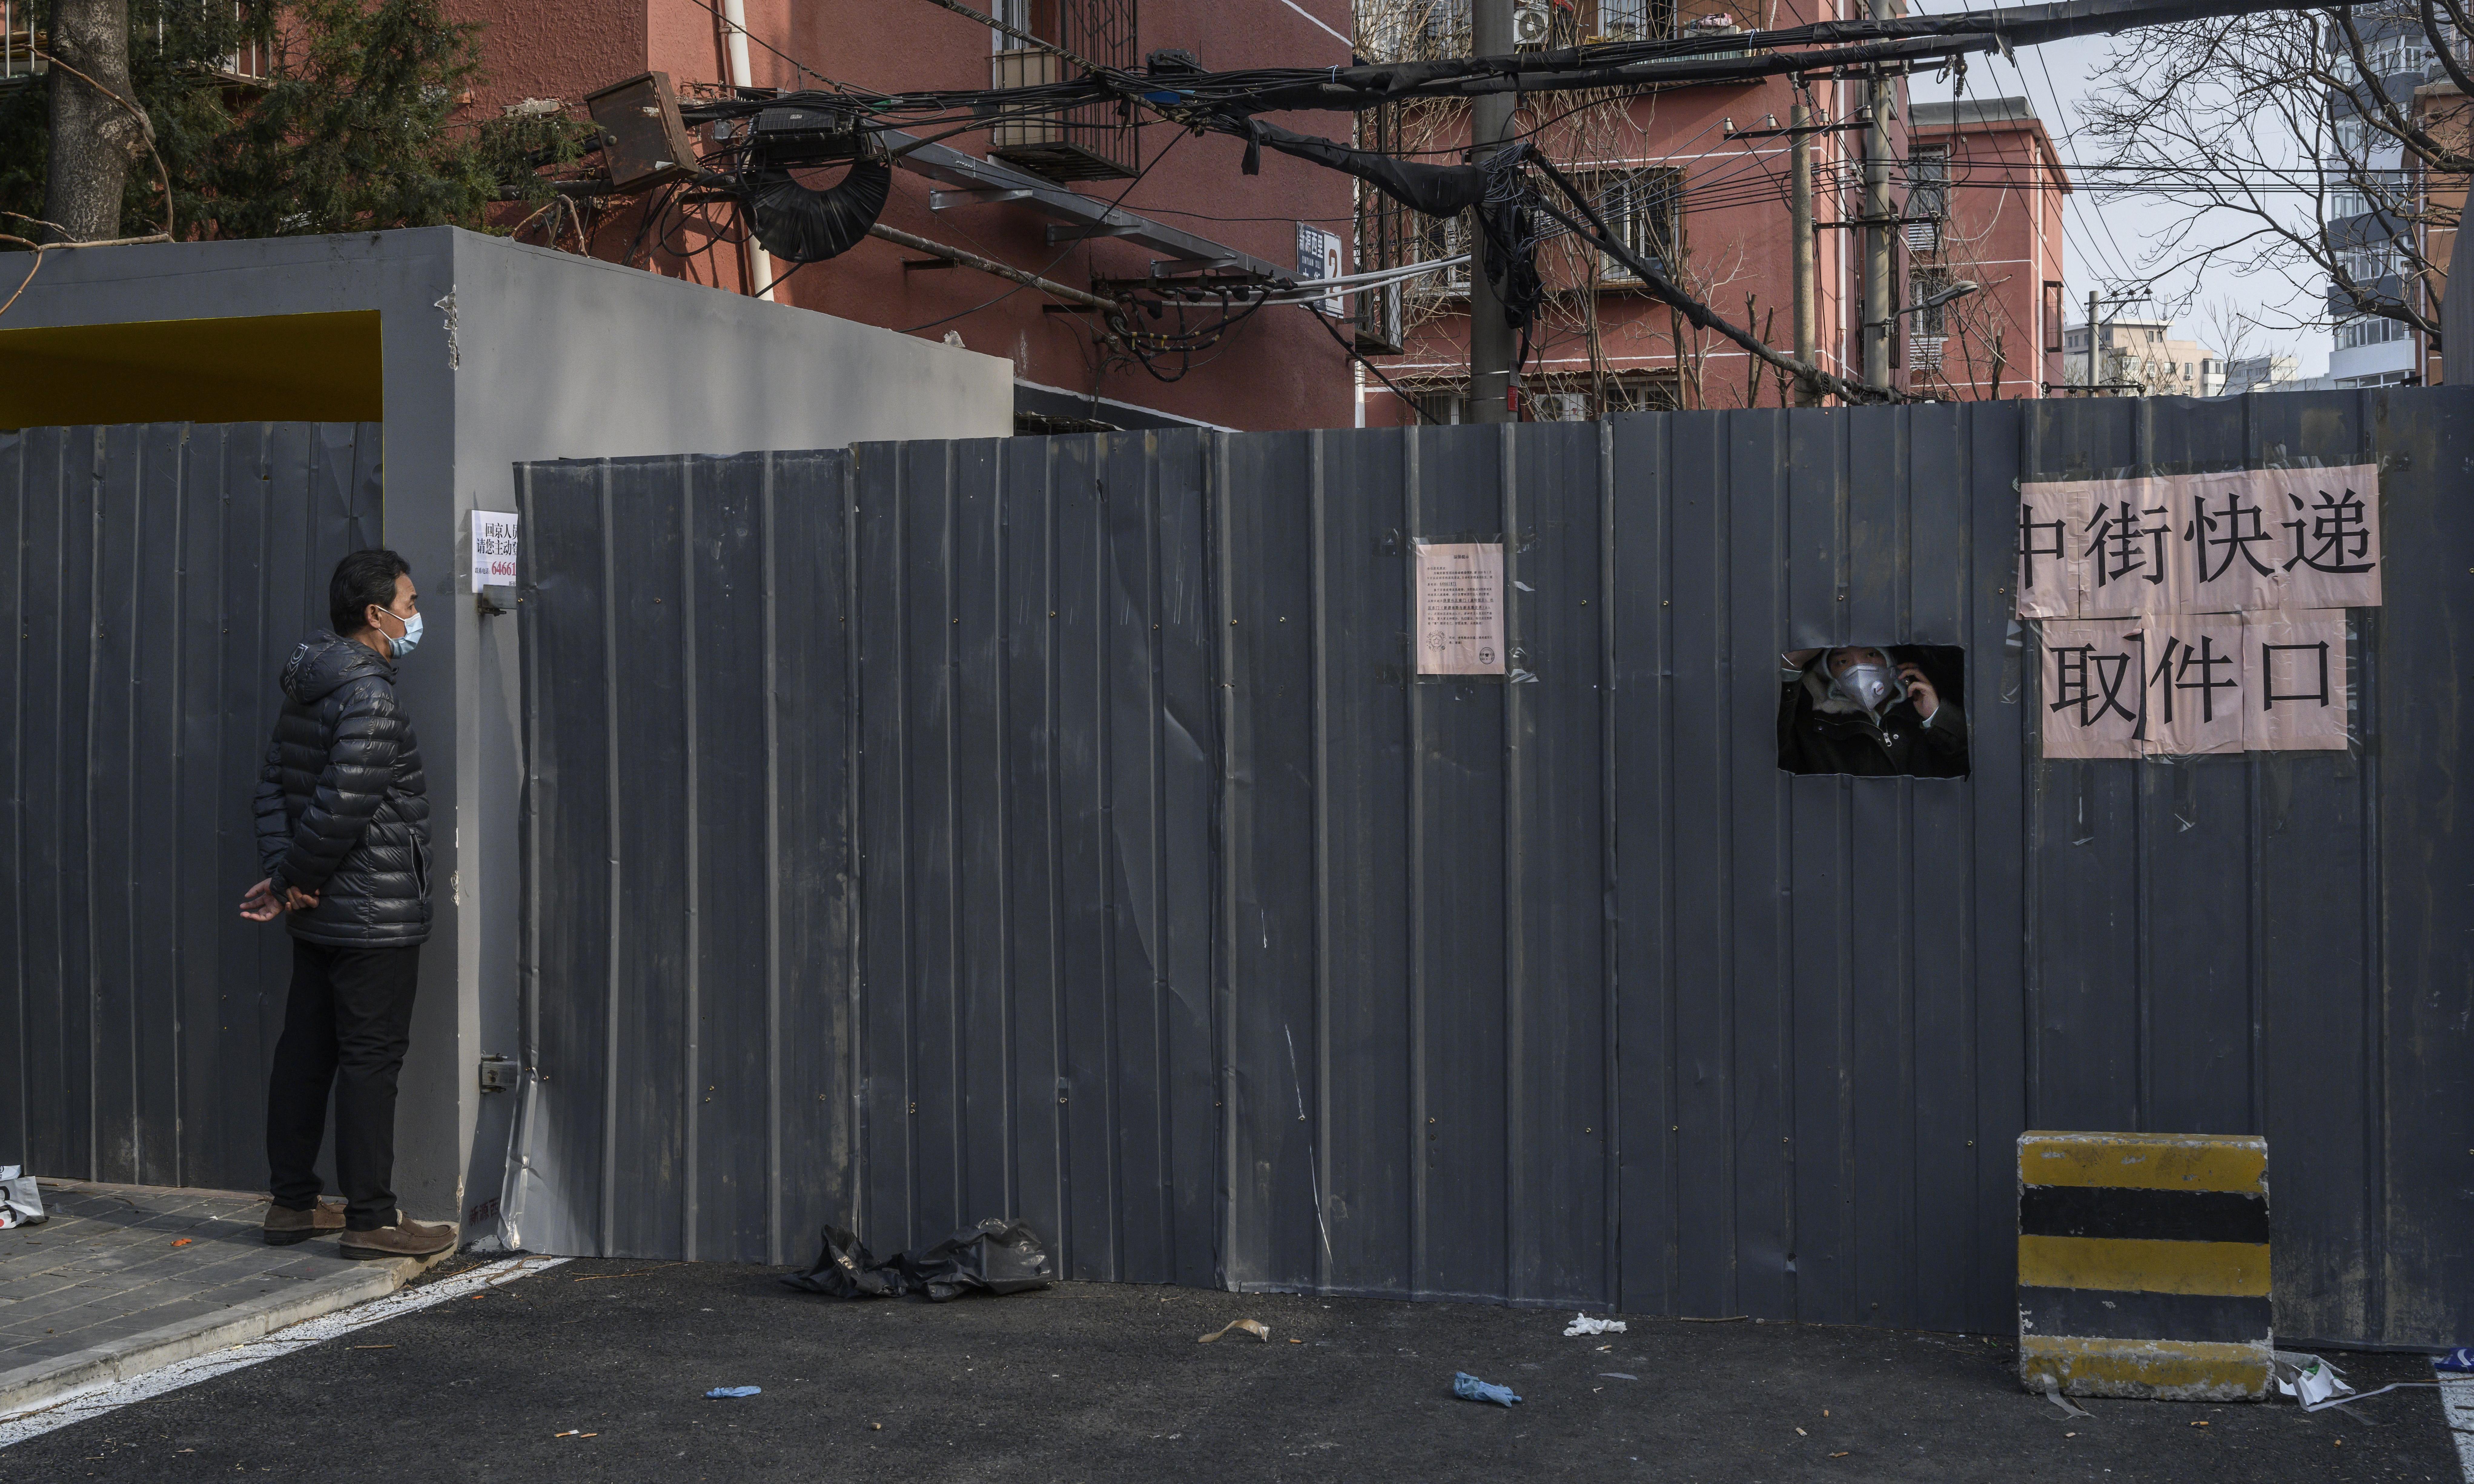 China: child found home alone with dead grandfather amid coronavirus lockdown